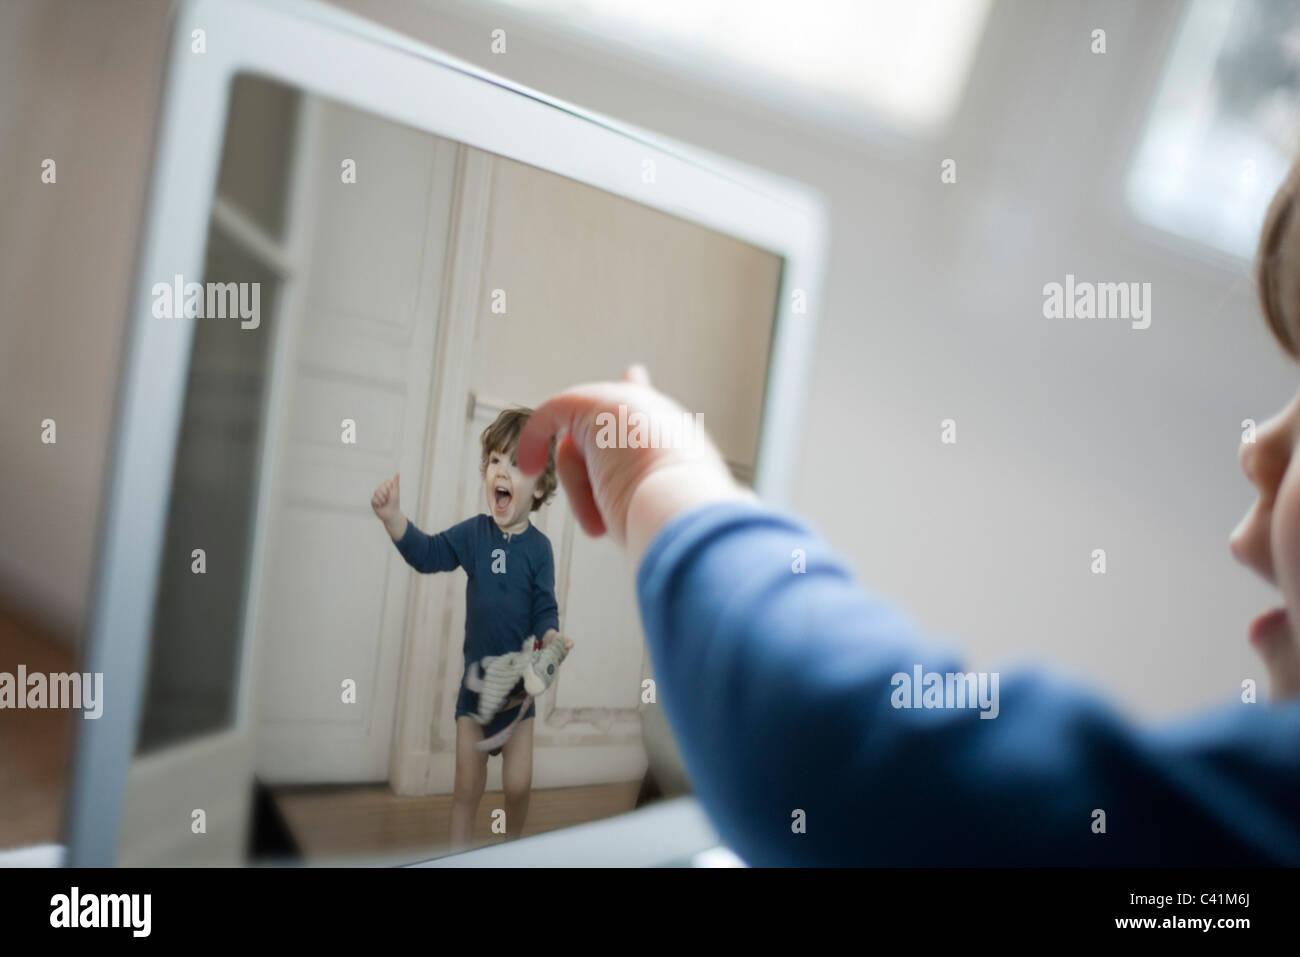 Toddler pointing at laptop screen - Stock Image